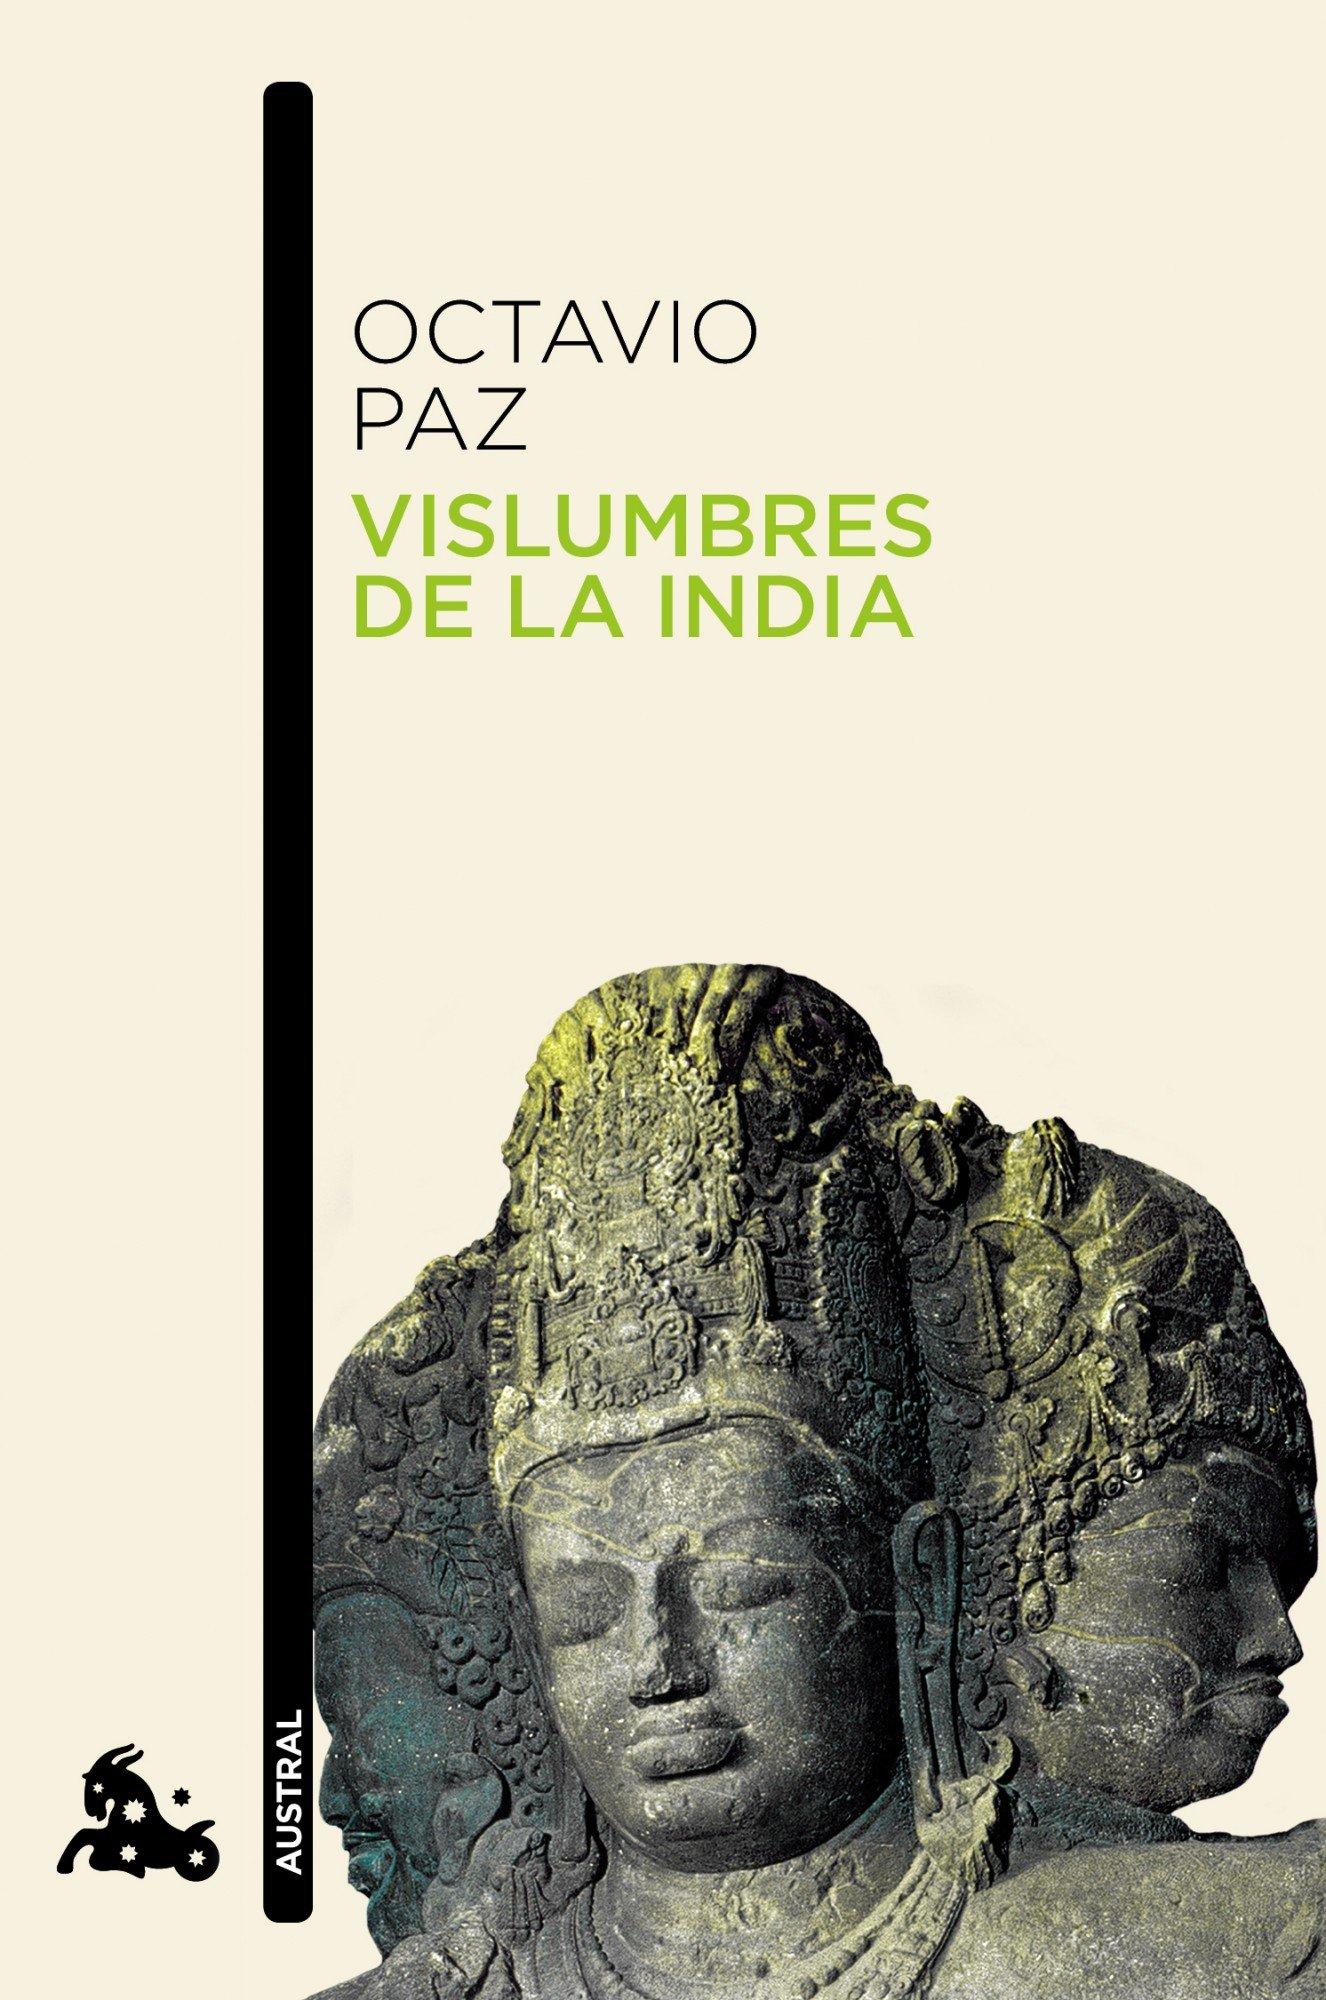 Vislumbres de la India (Contemporánea) Tapa blanda – 2 feb 2012 Octavio Paz Austral 8432248460 Anthropology